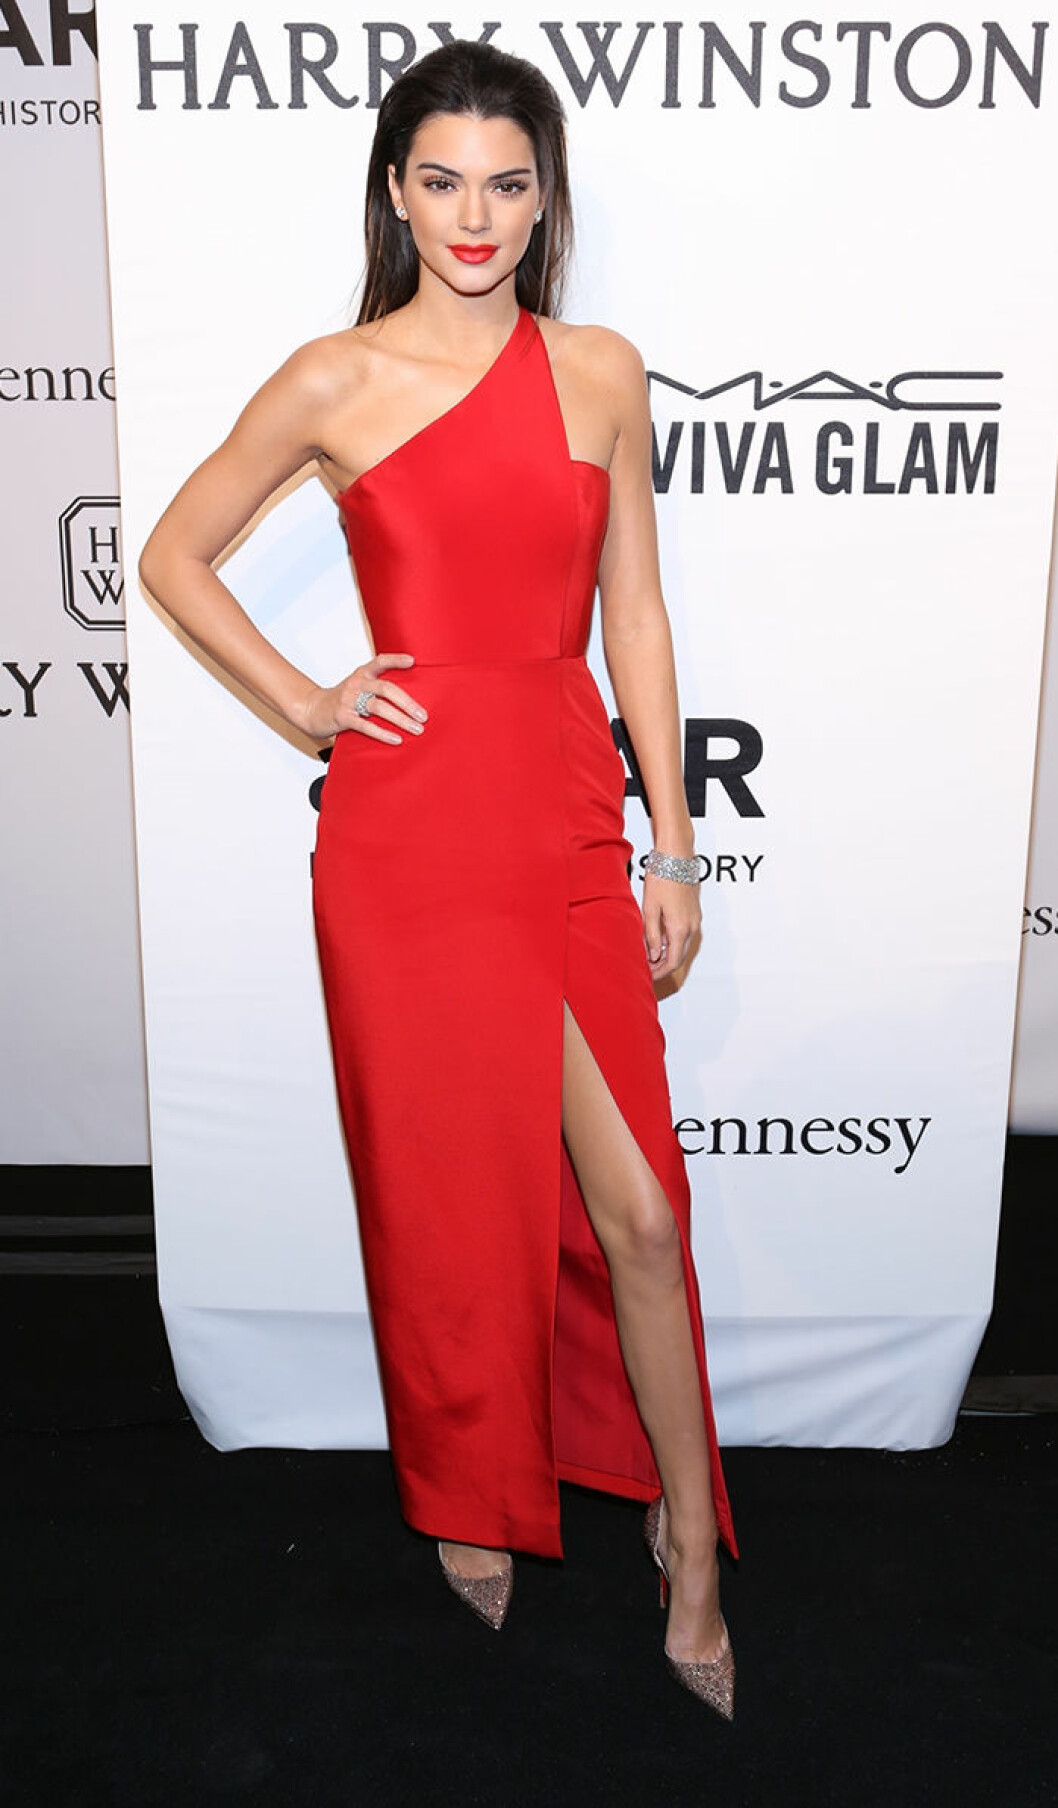 Kendall Jenner seen attending the 2015 amfAR New York Gala at Cipriani Wall Street